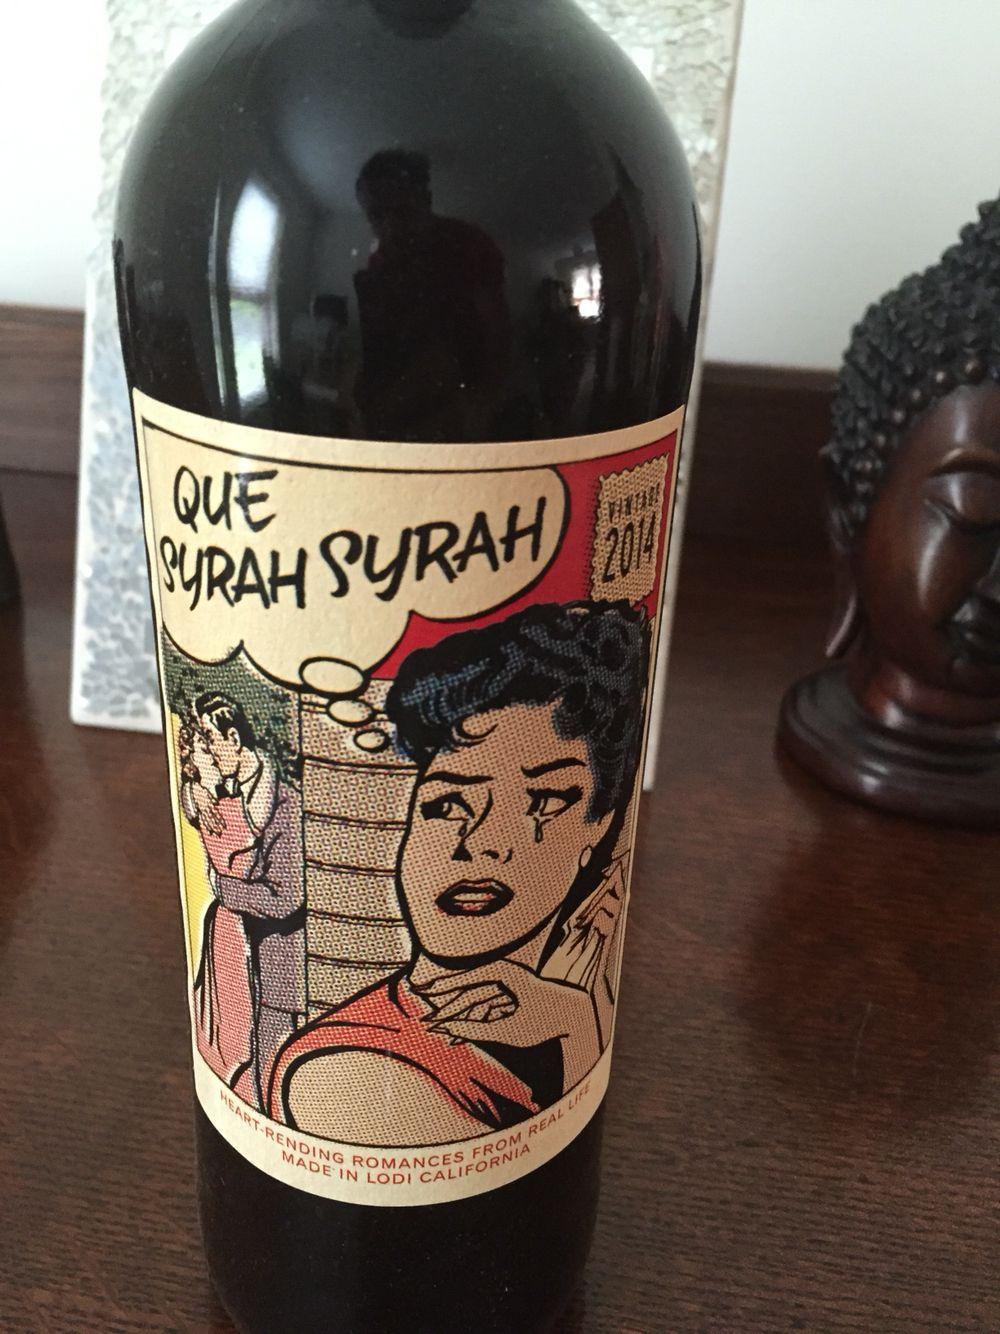 Que Syrah Syrah! Syrah, Wine bottle, Bottle